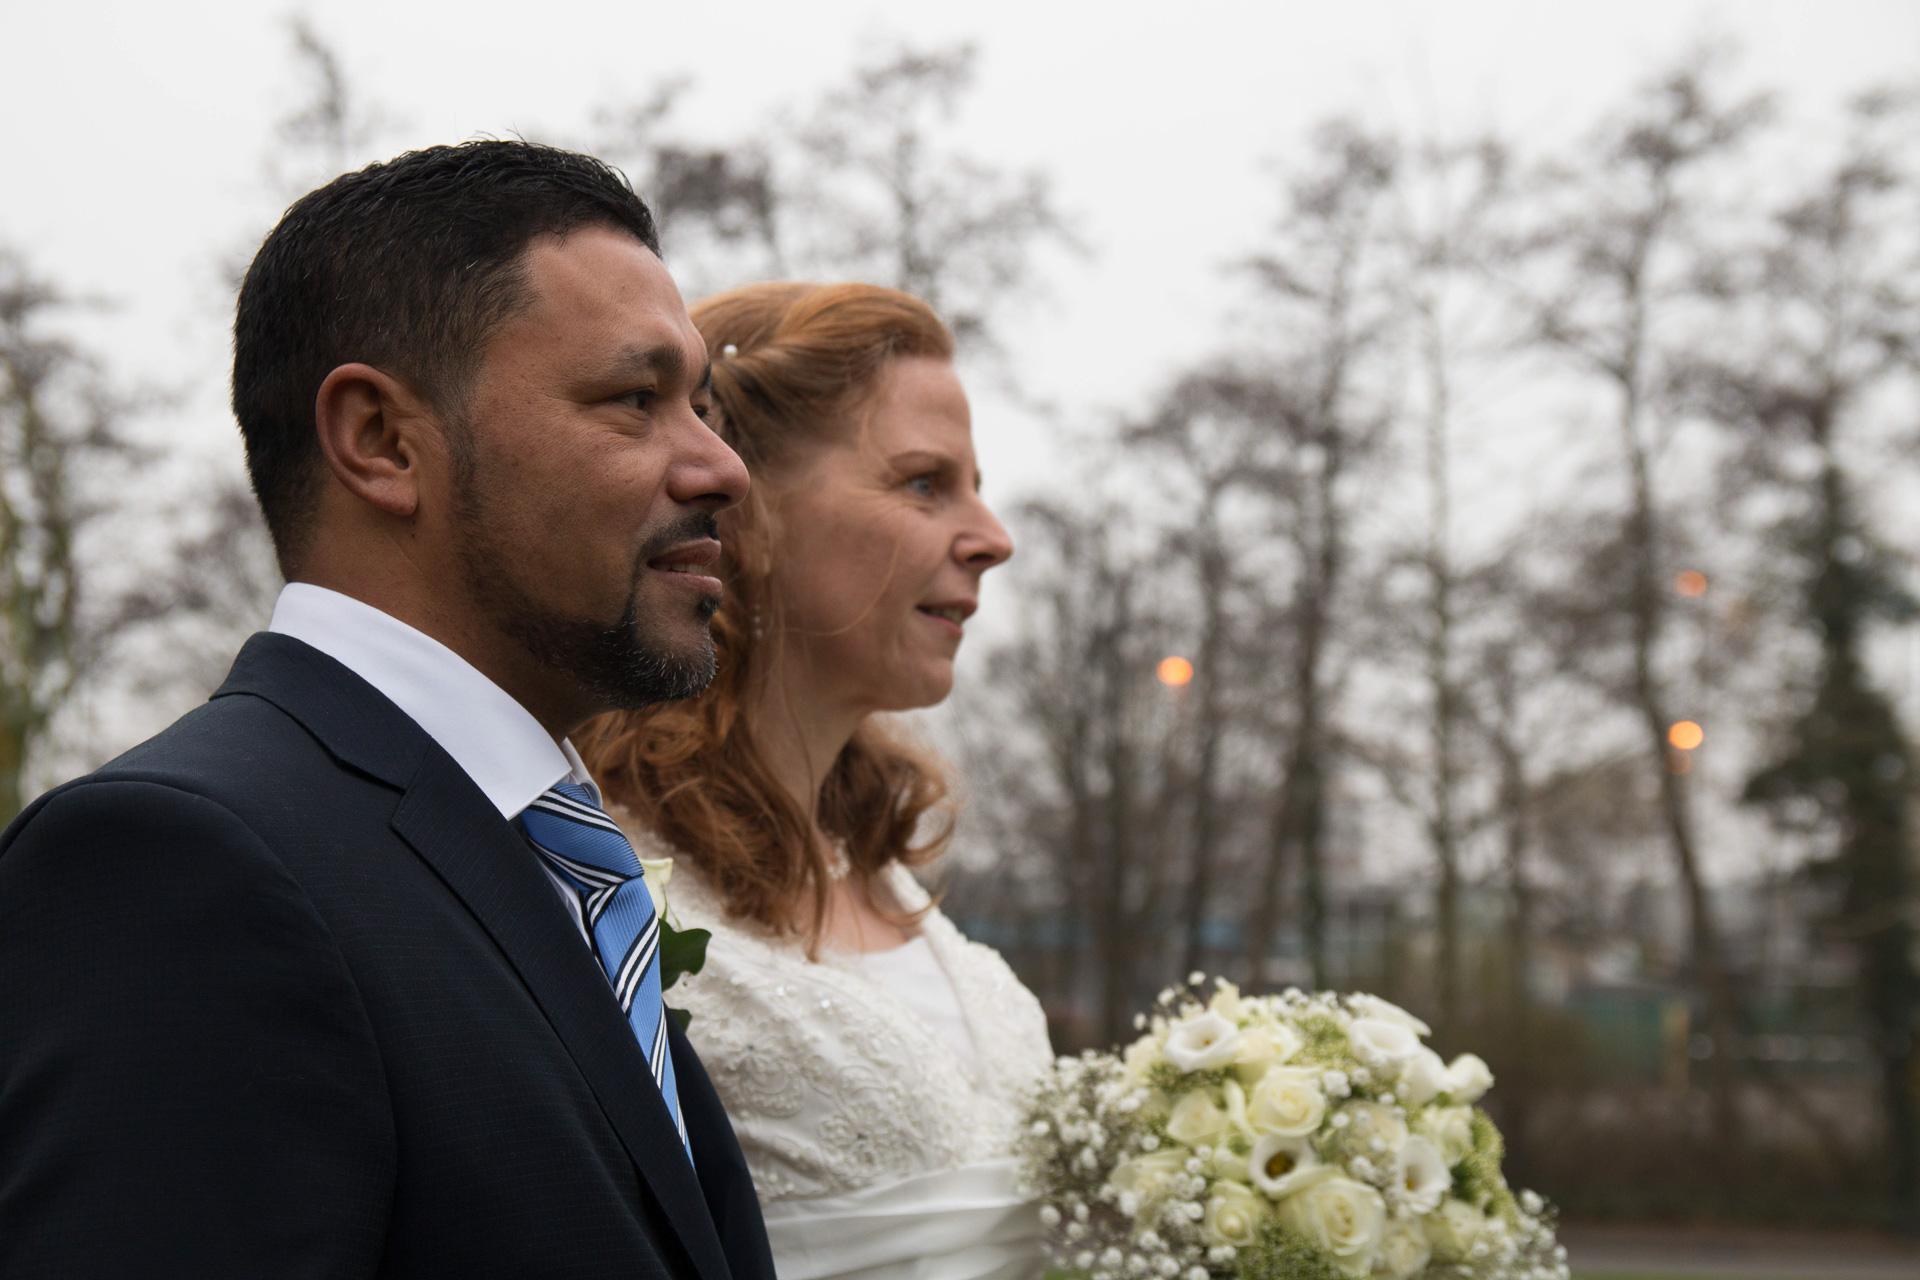 Bruiloft Marieke en Cressencio, fotografie december 2016 / Canon 70D